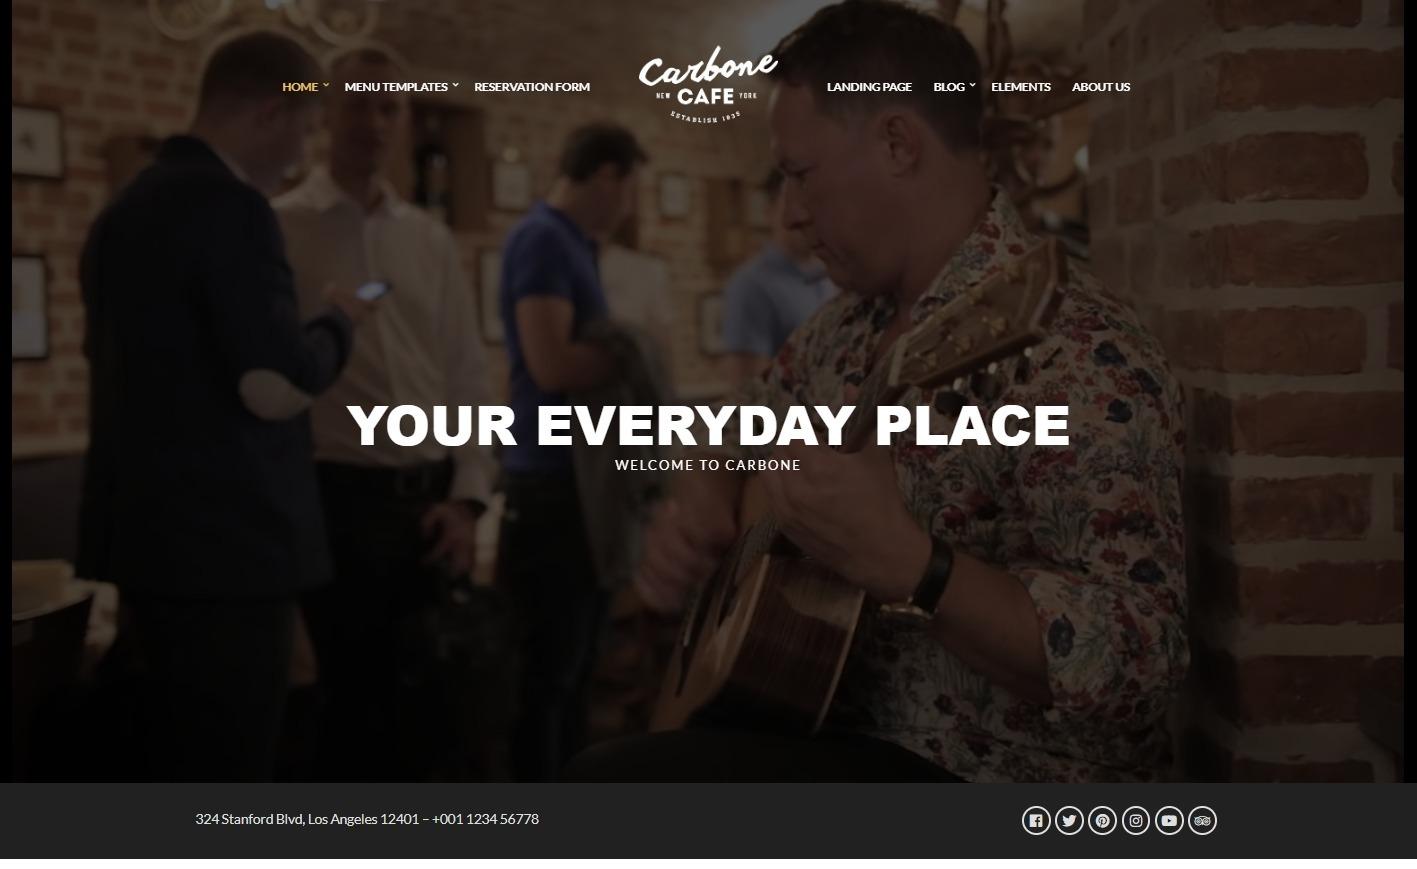 Carbone Cafe Multi Dimensional Restaurant WordPress Theme